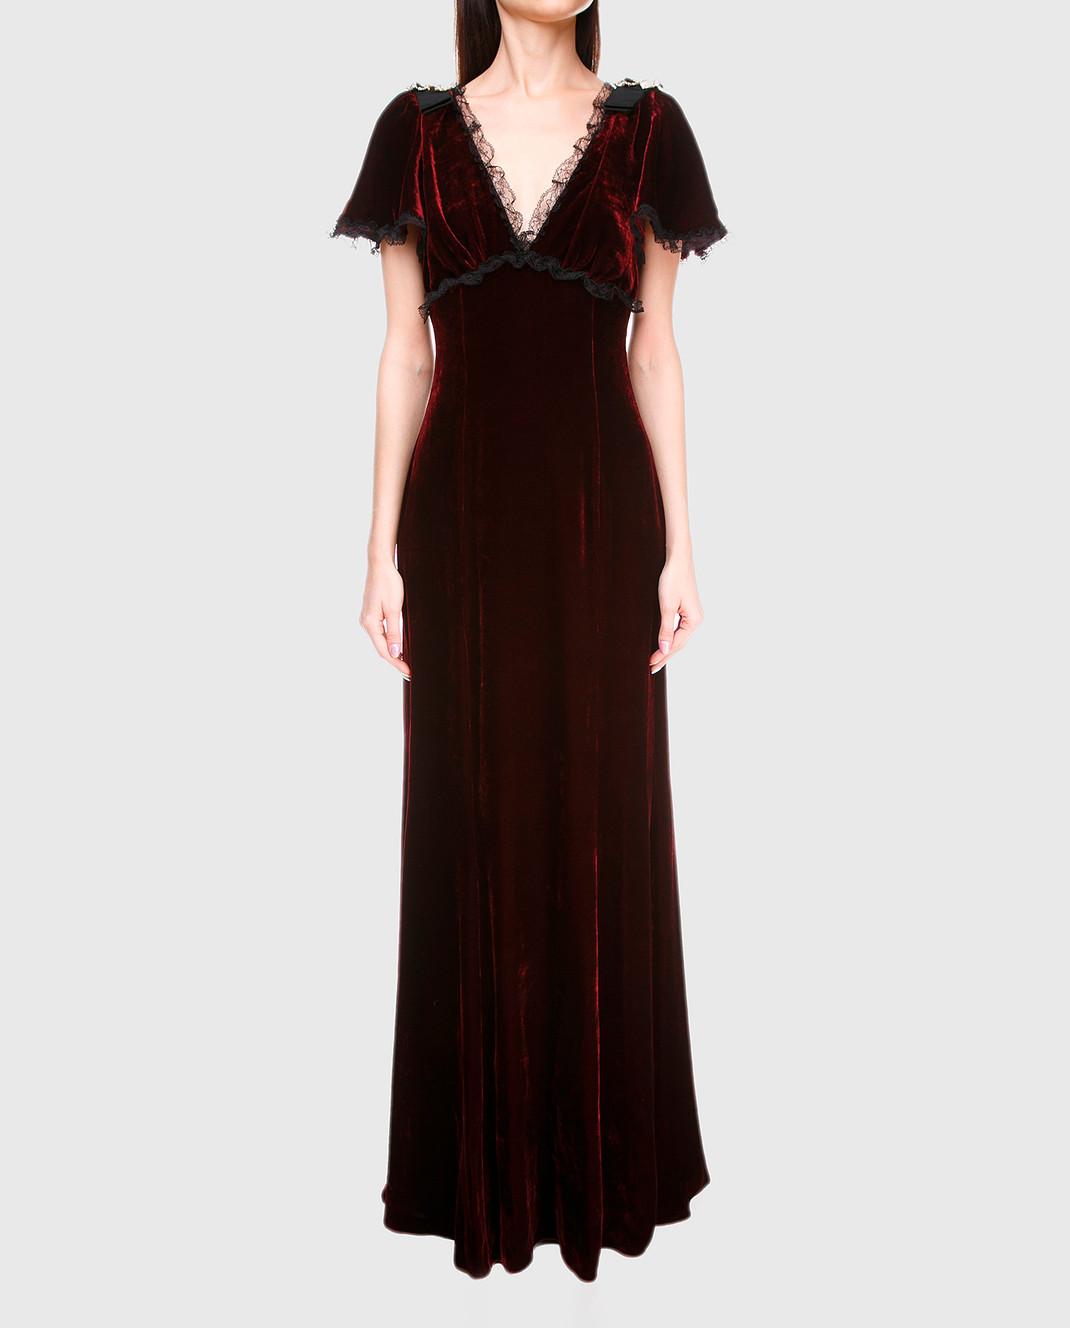 Dolce&Gabbana Бордовое платье F66E1ZFUVH9 изображение 3